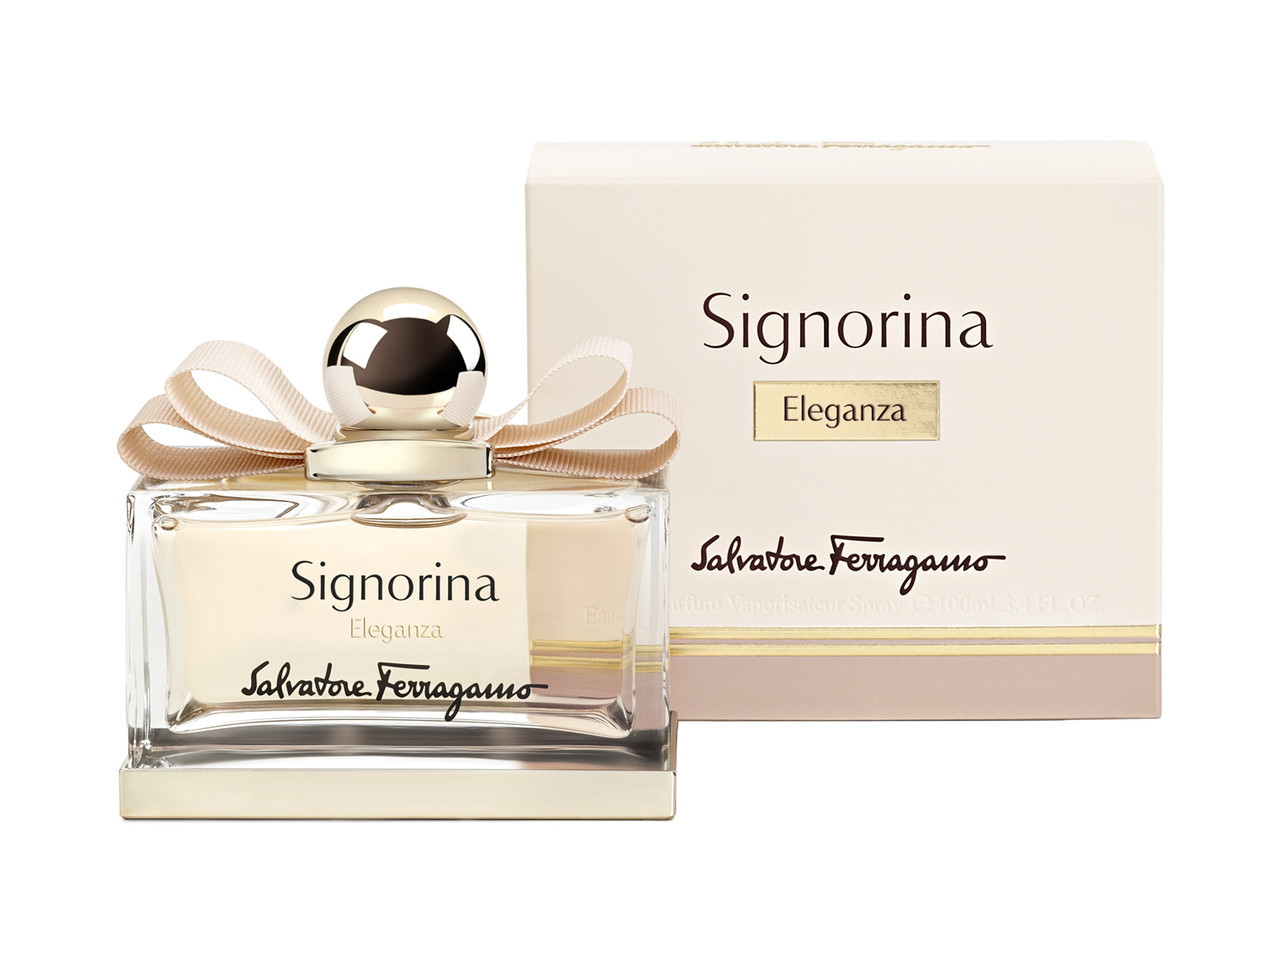 Salvatore Ferragamo Signorina Eleganza 100мл жіноча парфумована вода (женская парфюмерная вода) (Реплика)